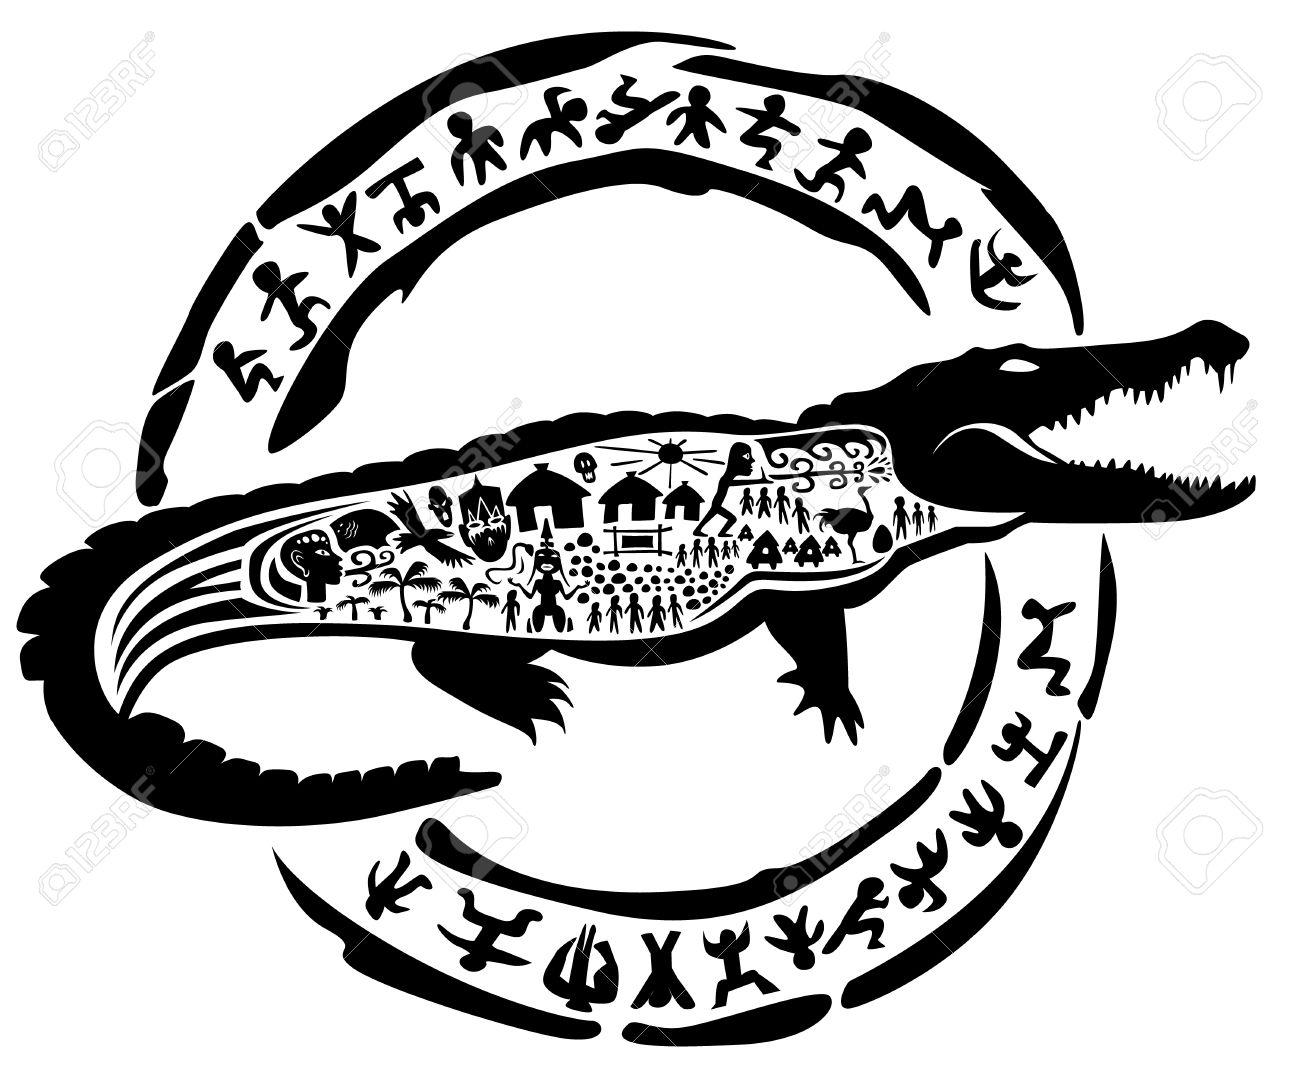 5be550406a3f3 tribal crocodile, alligator, caiman, illustration, tattoo stamp Stock  Vector - 38031656